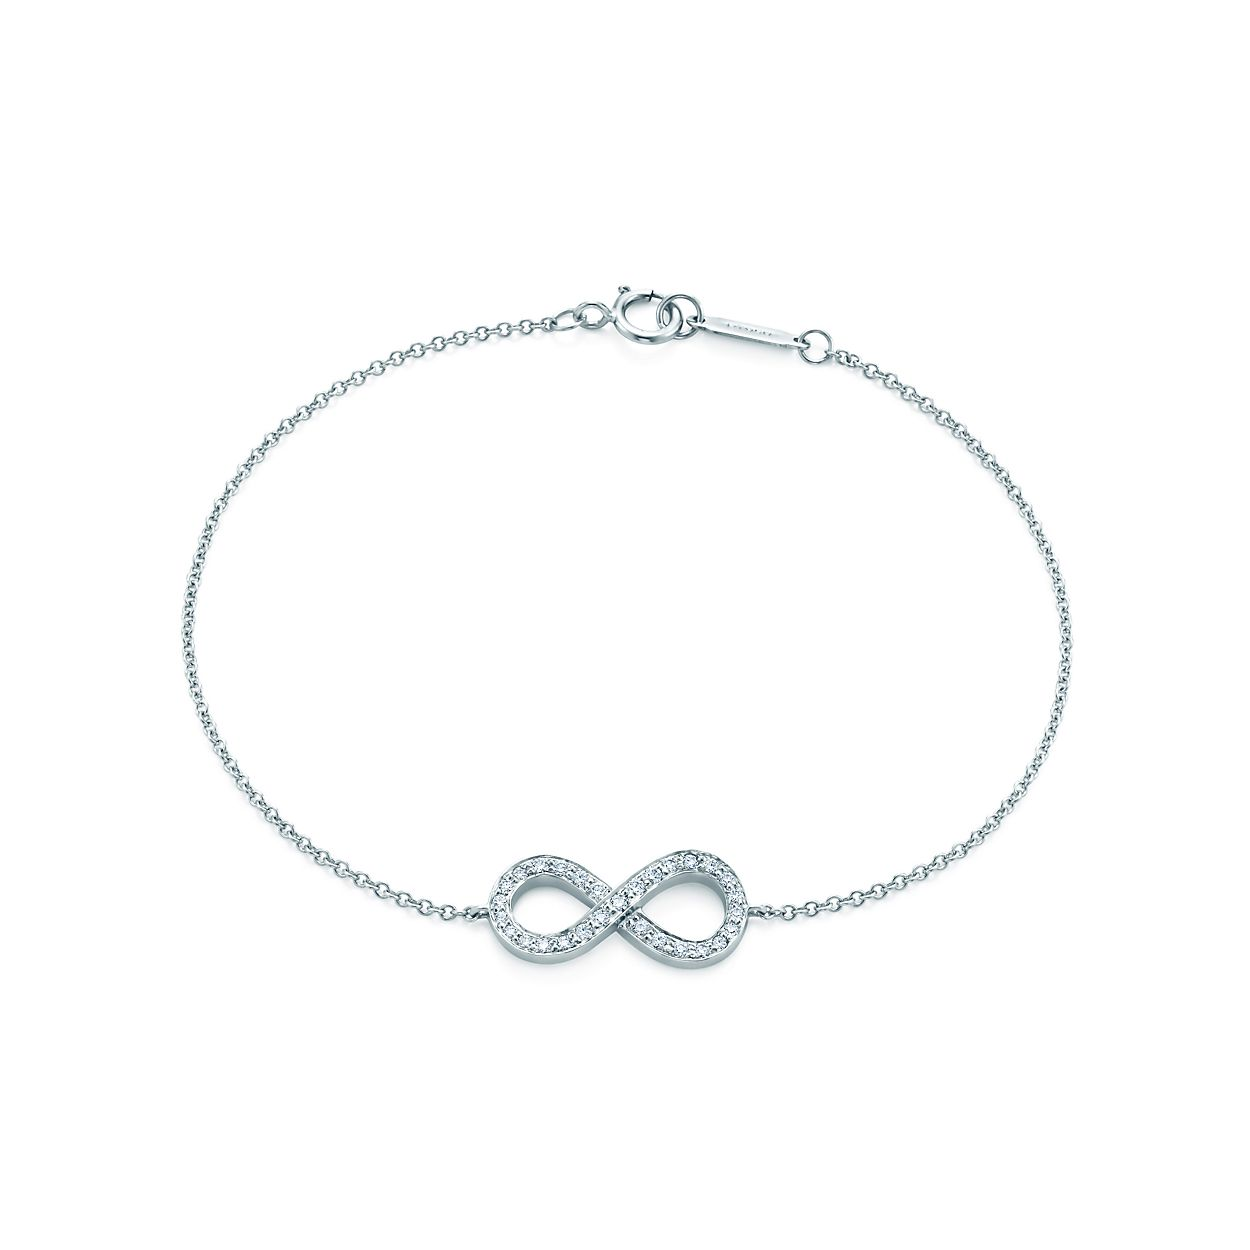 Tiffany Bow bracelet in platinum with diamonds, medium - Size 6.5 IN Tiffany & Co.